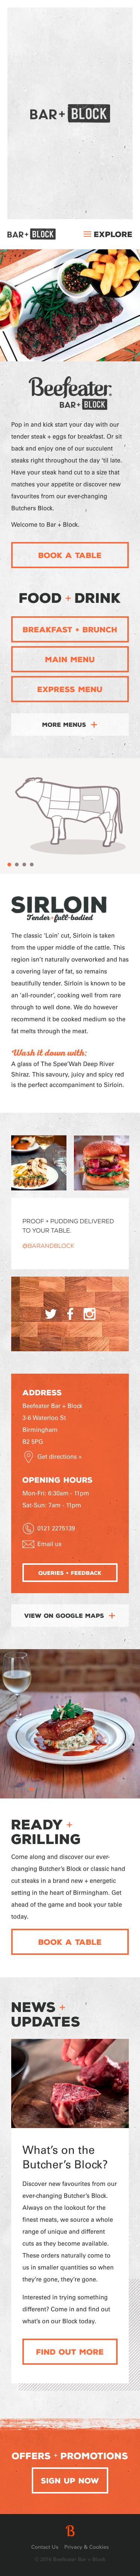 Barandblock 04